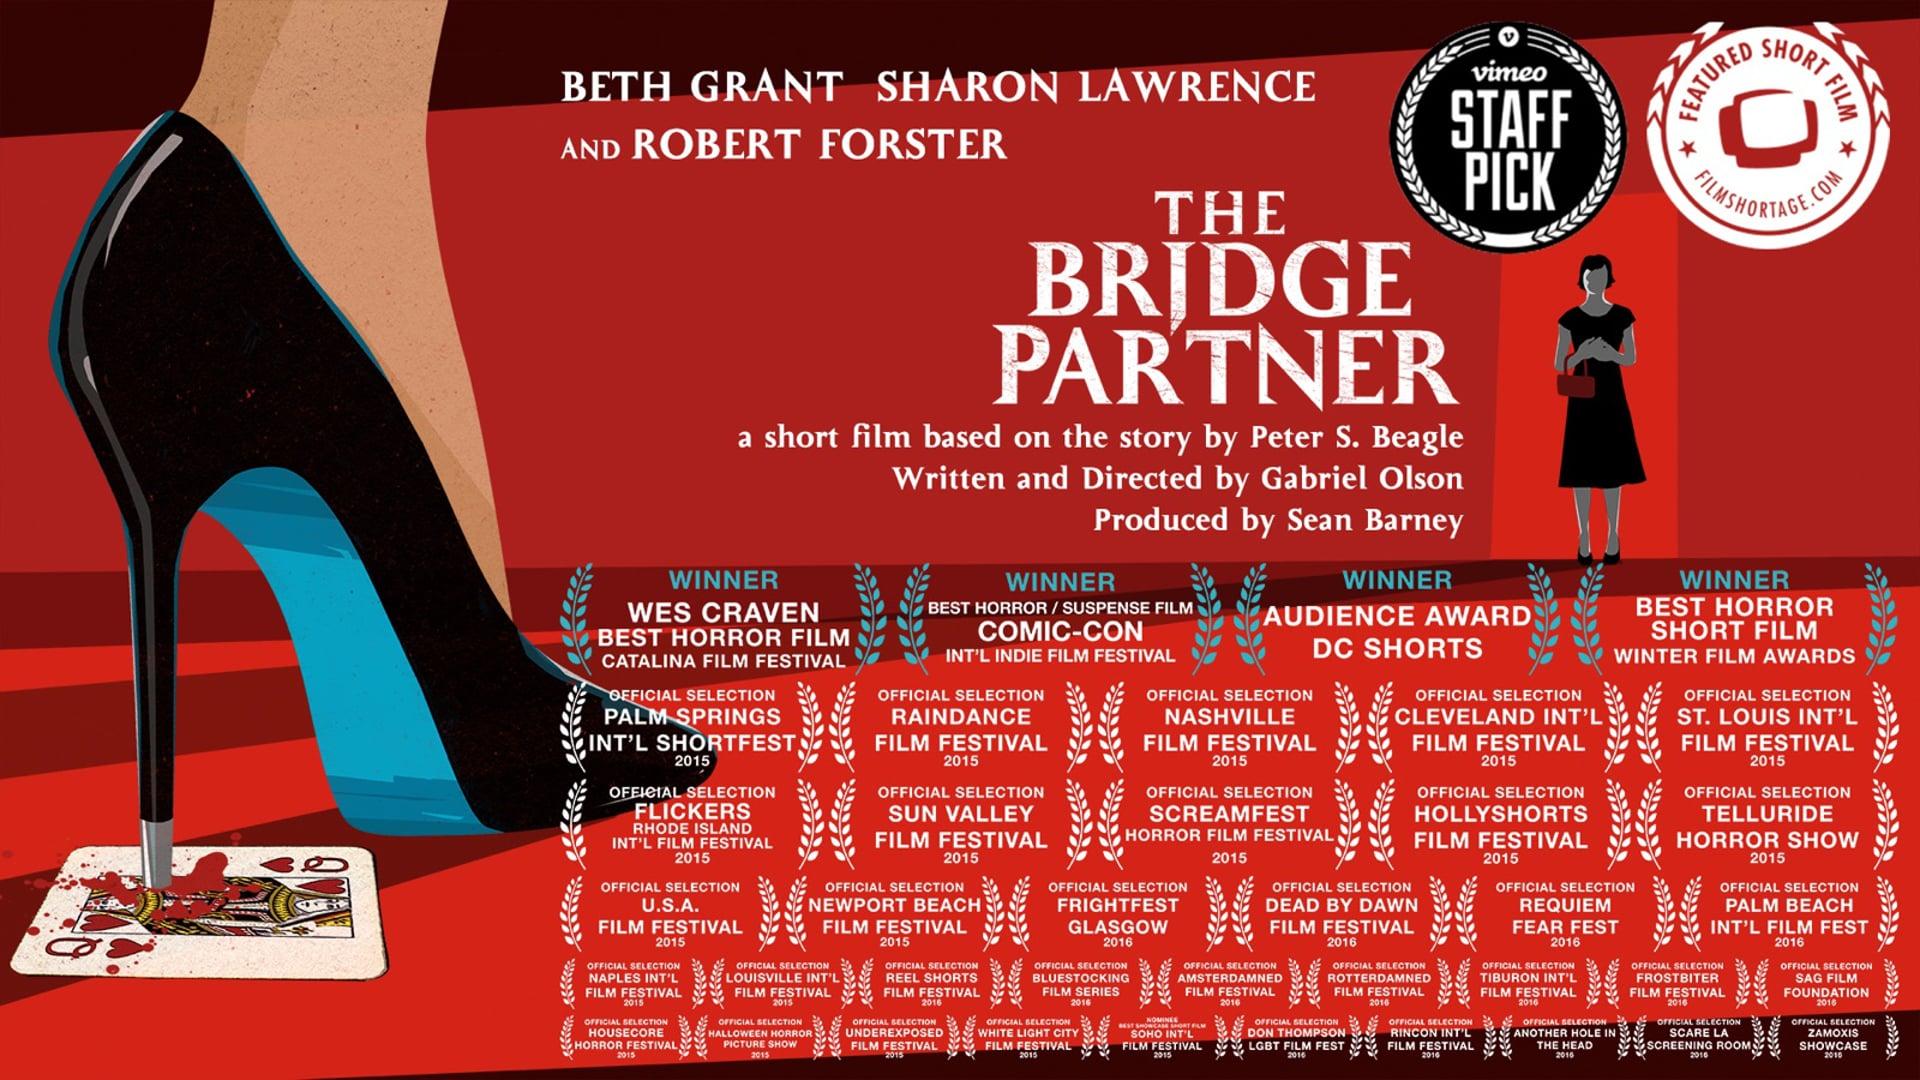 THE BRIDGE PARTNER - Short Film